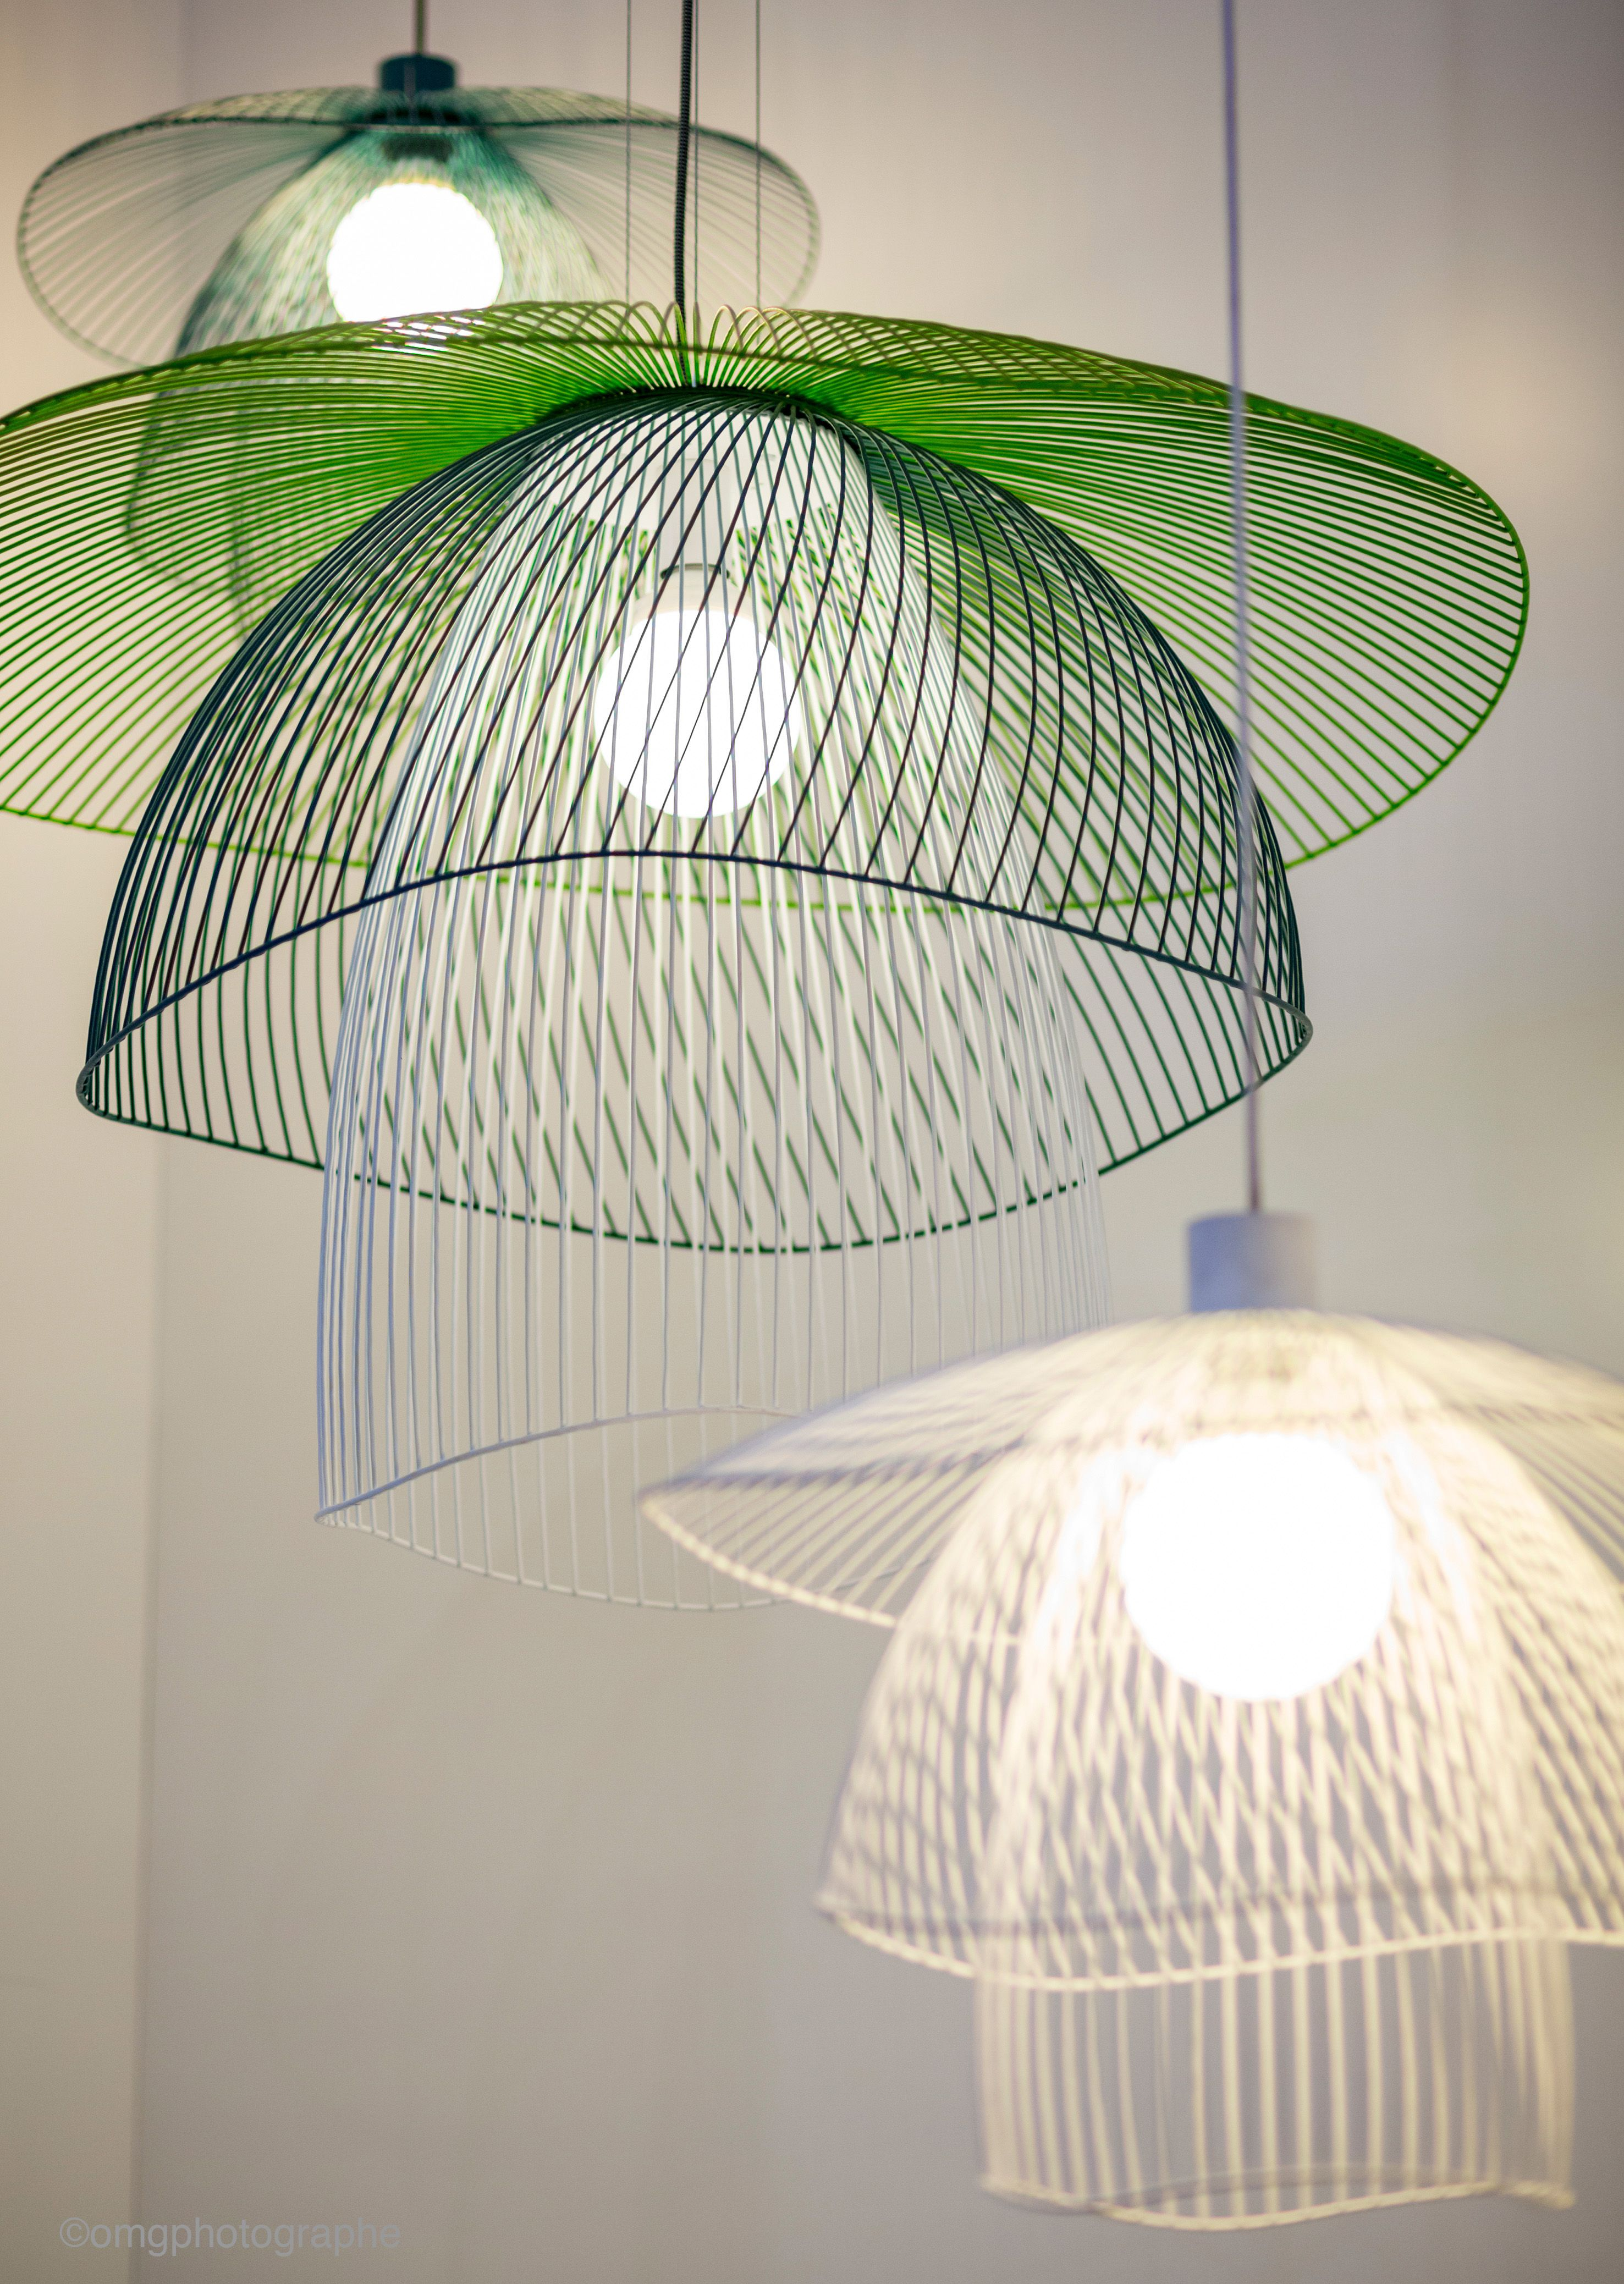 forestier maison objet septembre 2015 living room pinterest forestier maison objet. Black Bedroom Furniture Sets. Home Design Ideas